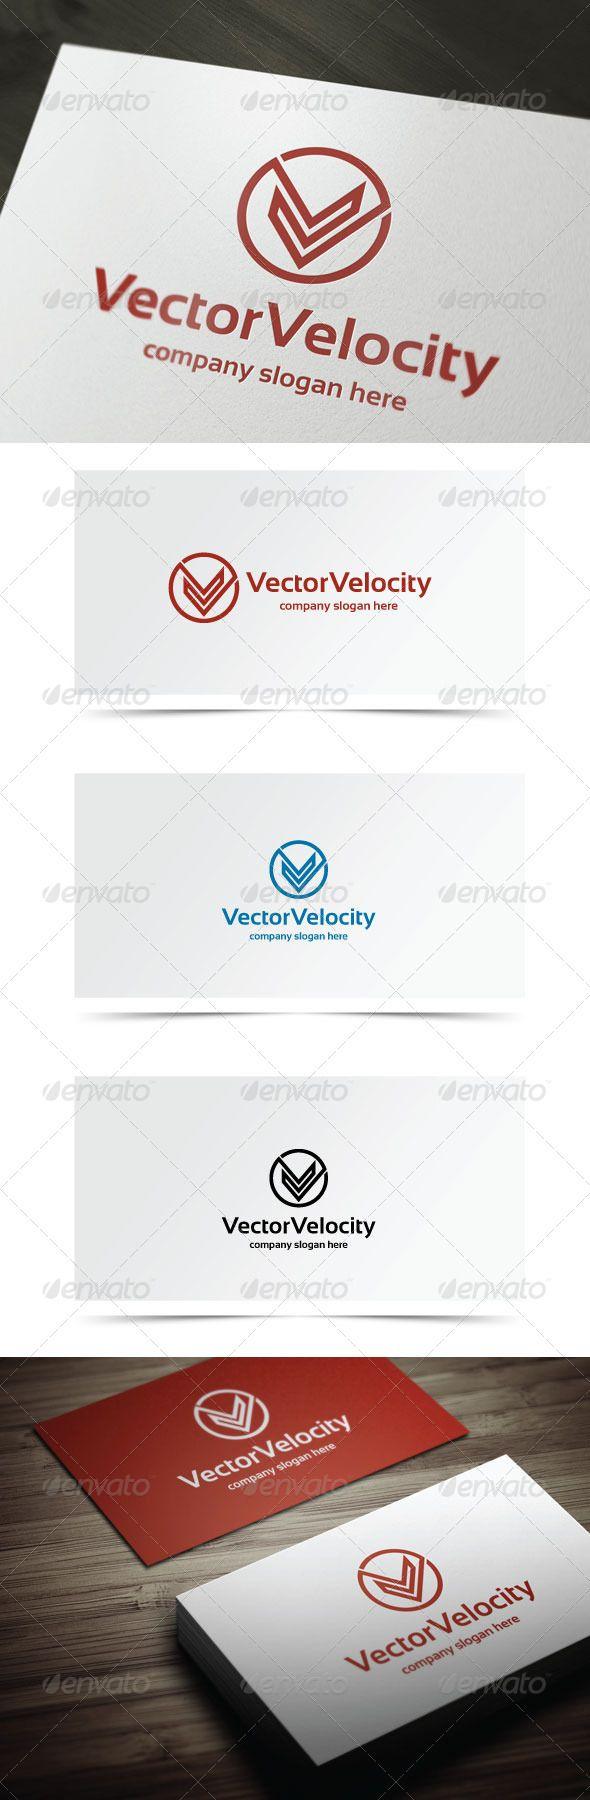 8 best gp images on Pinterest | Brand identity, Health logo and Logo ...